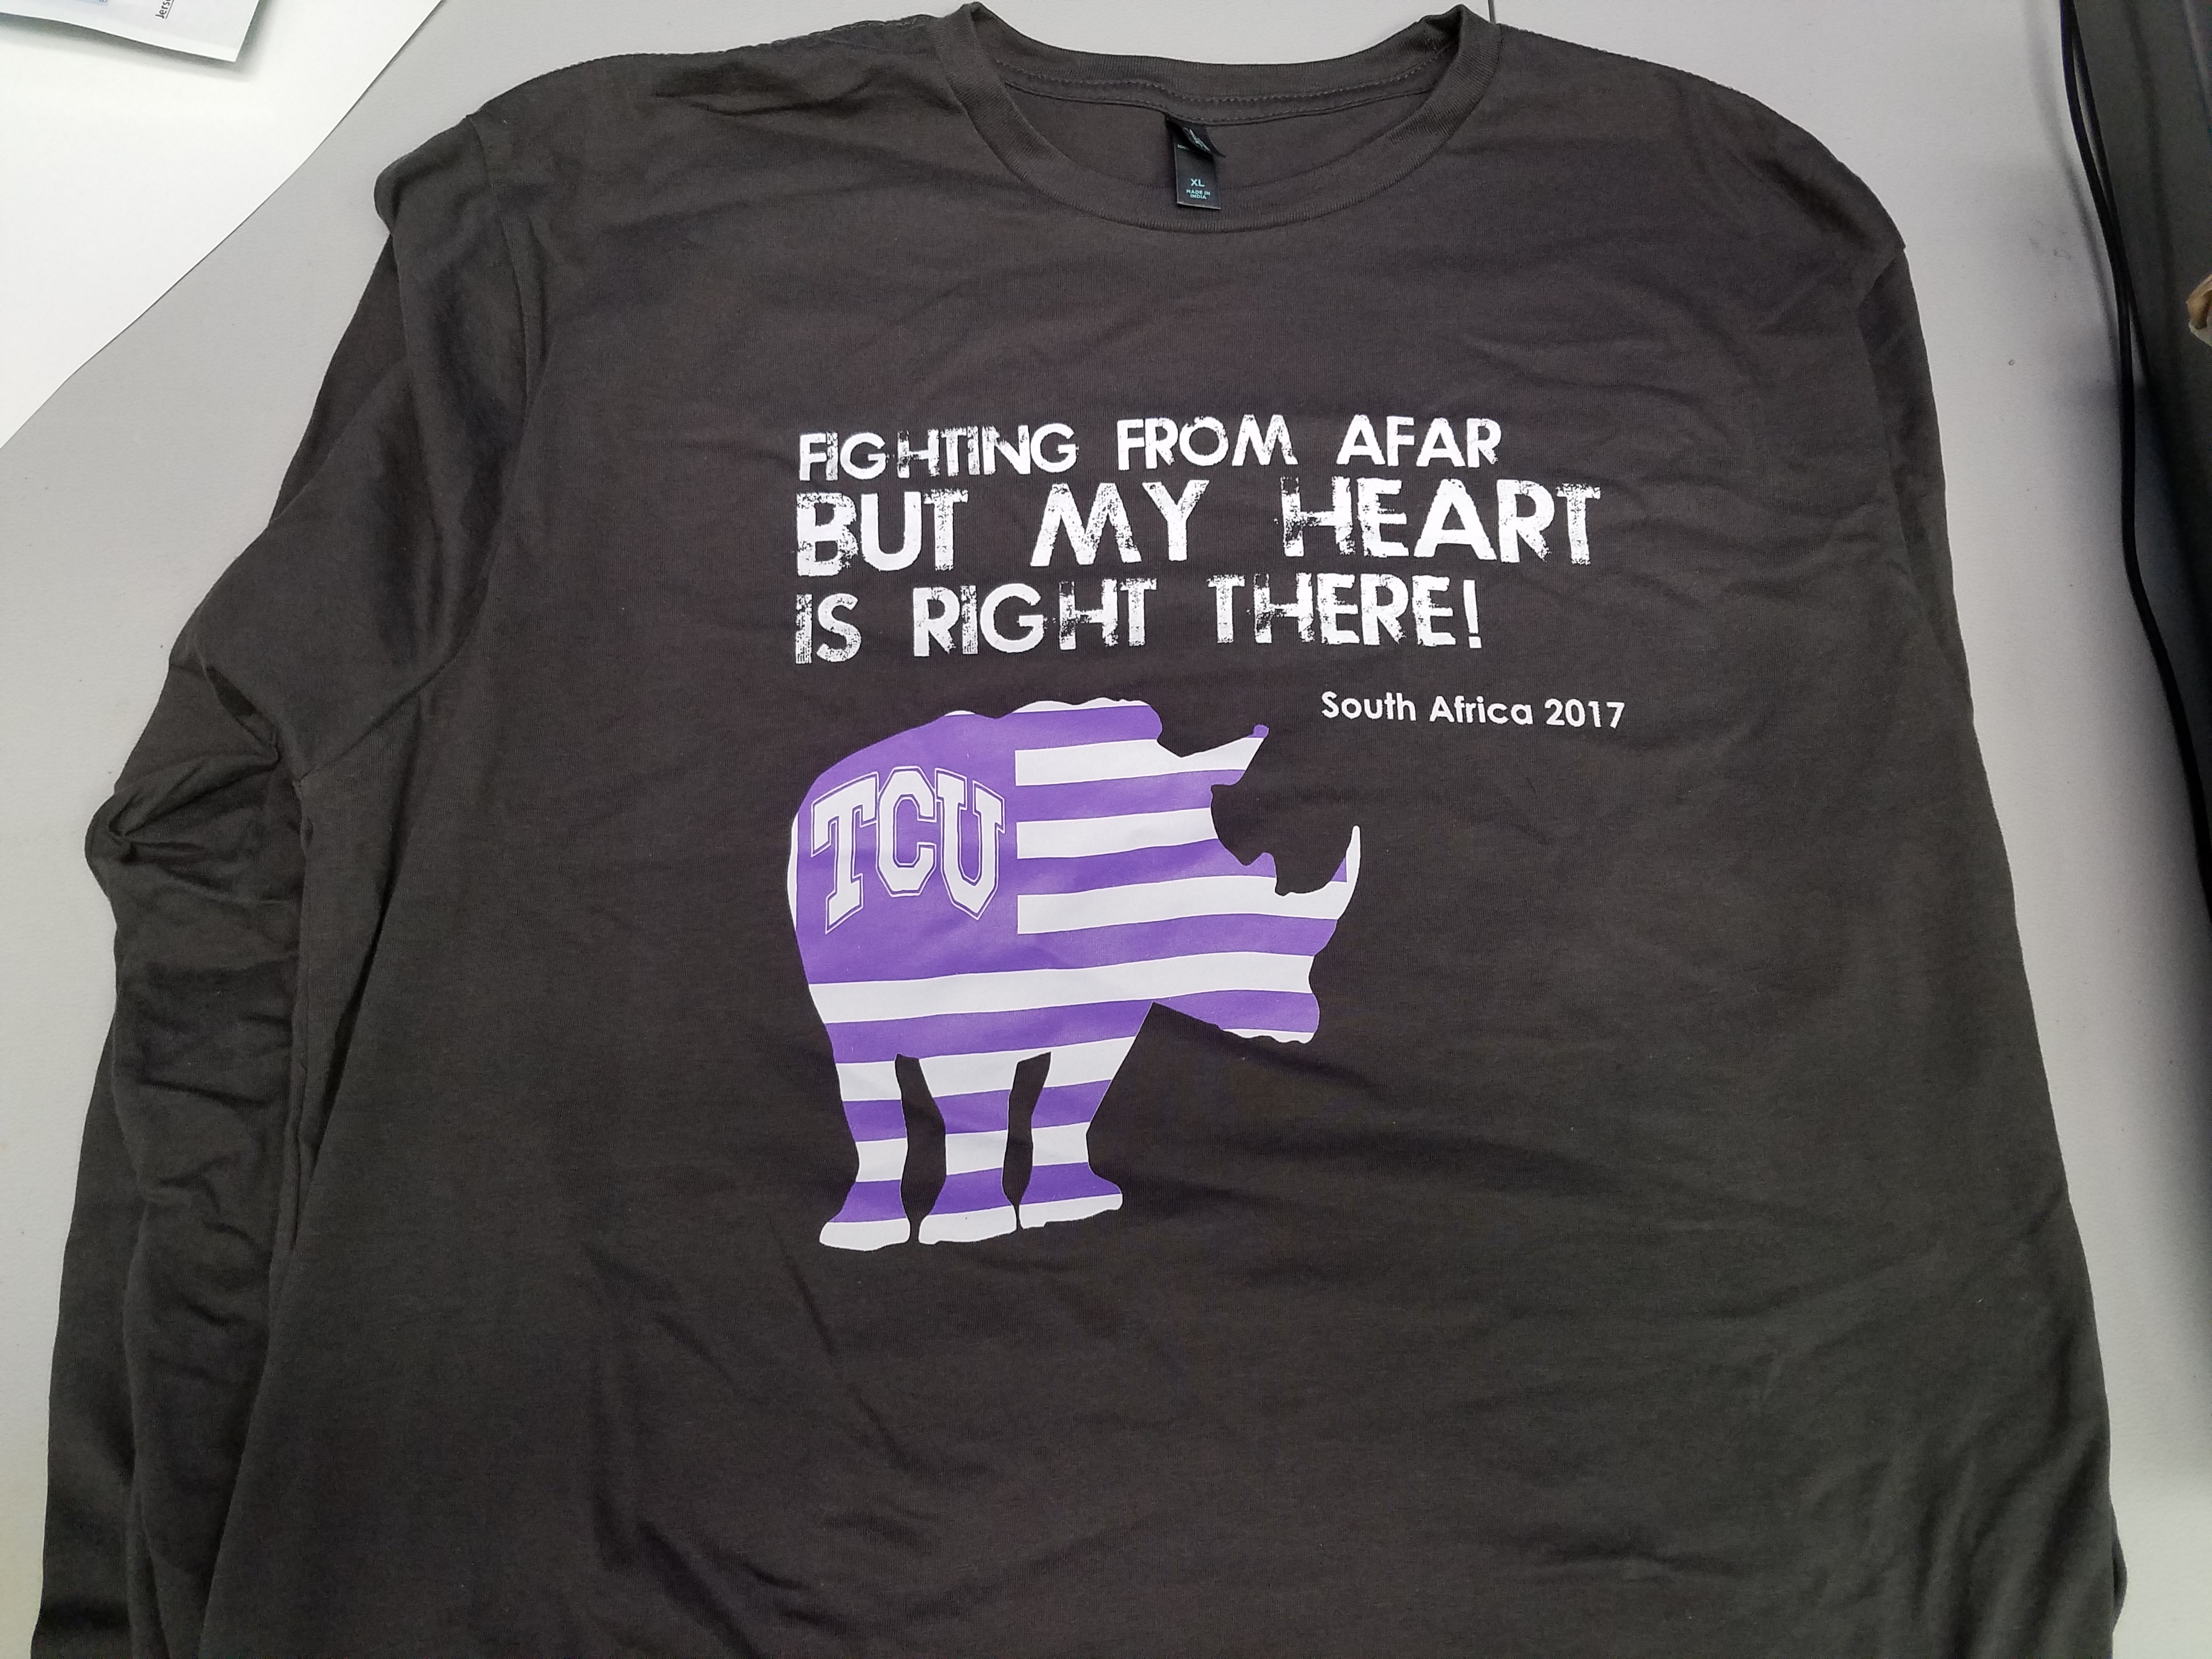 Charity Shirts